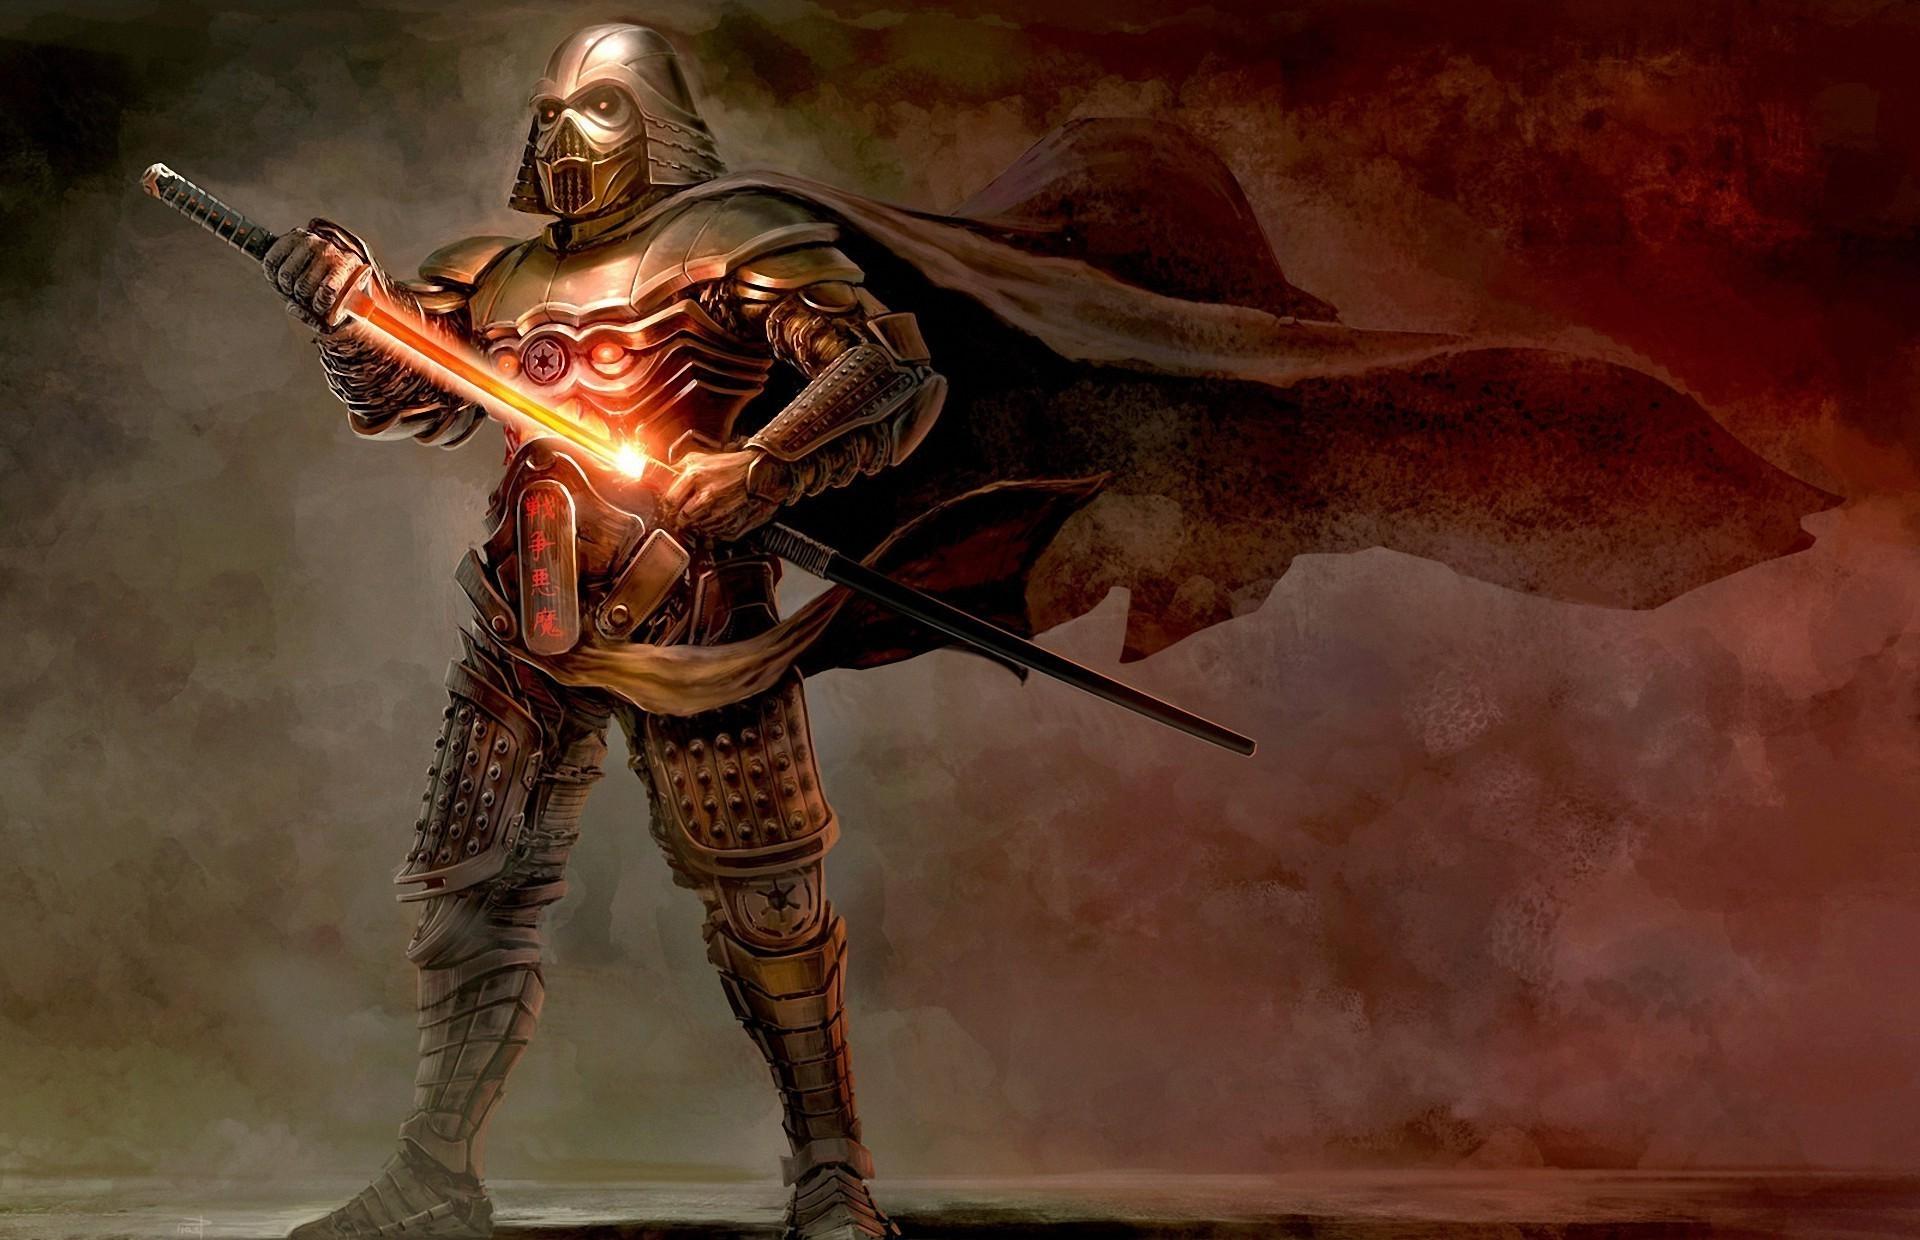 Darth Vader, Samurai, Artwork, Fantasy Art, Concept Art, Sword, Katana, Star  Wars Wallpapers HD / Desktop and Mobile Backgrounds